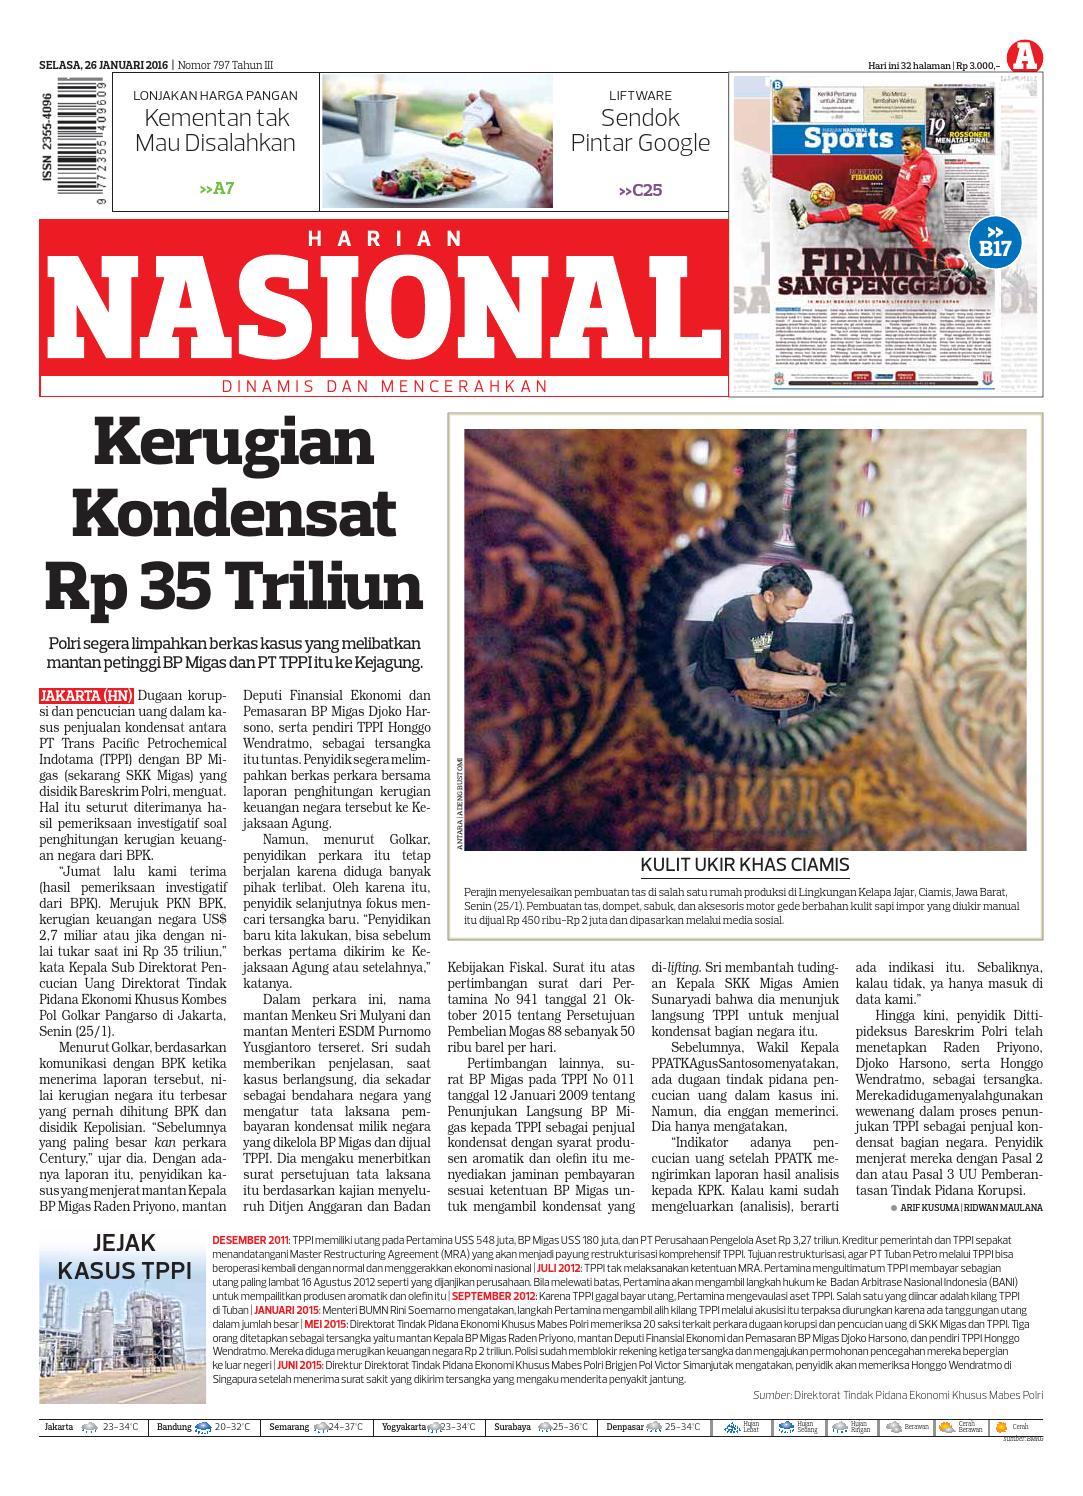 Harian Nasional By Issuu Produk Ukm Bumn Kain Batik Middle Premium Sutera